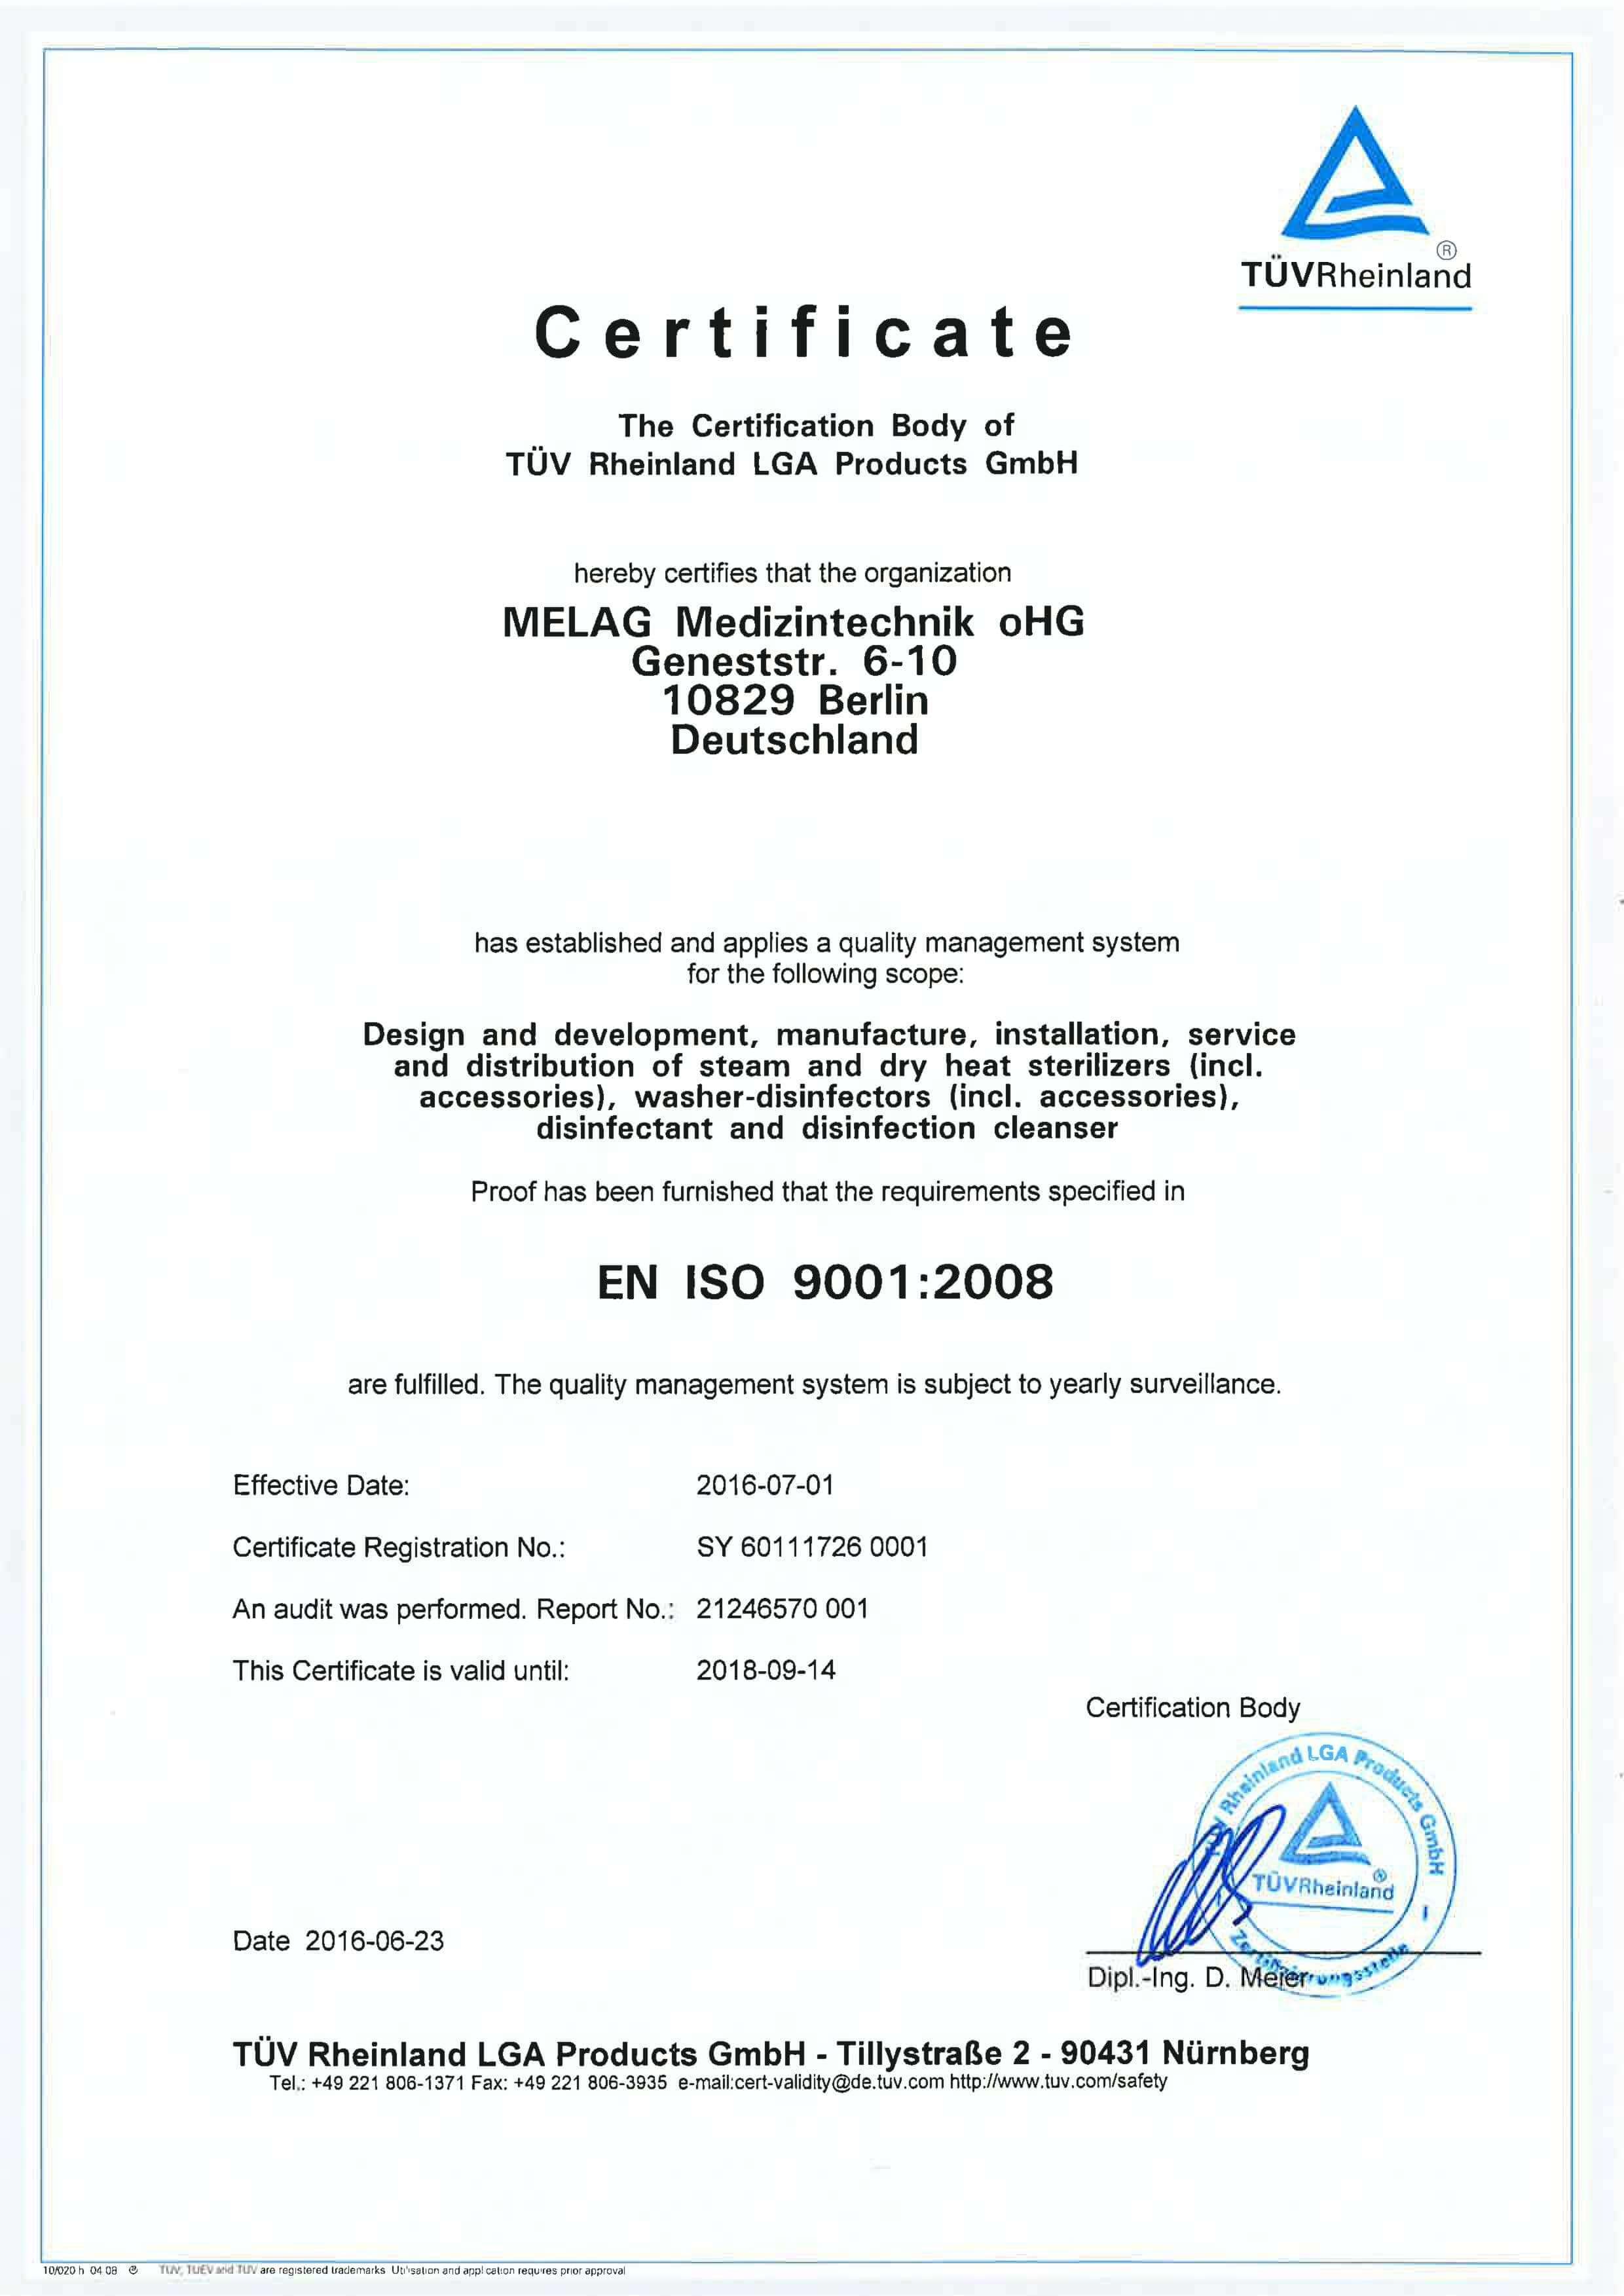 Certyfikat ISO Melag